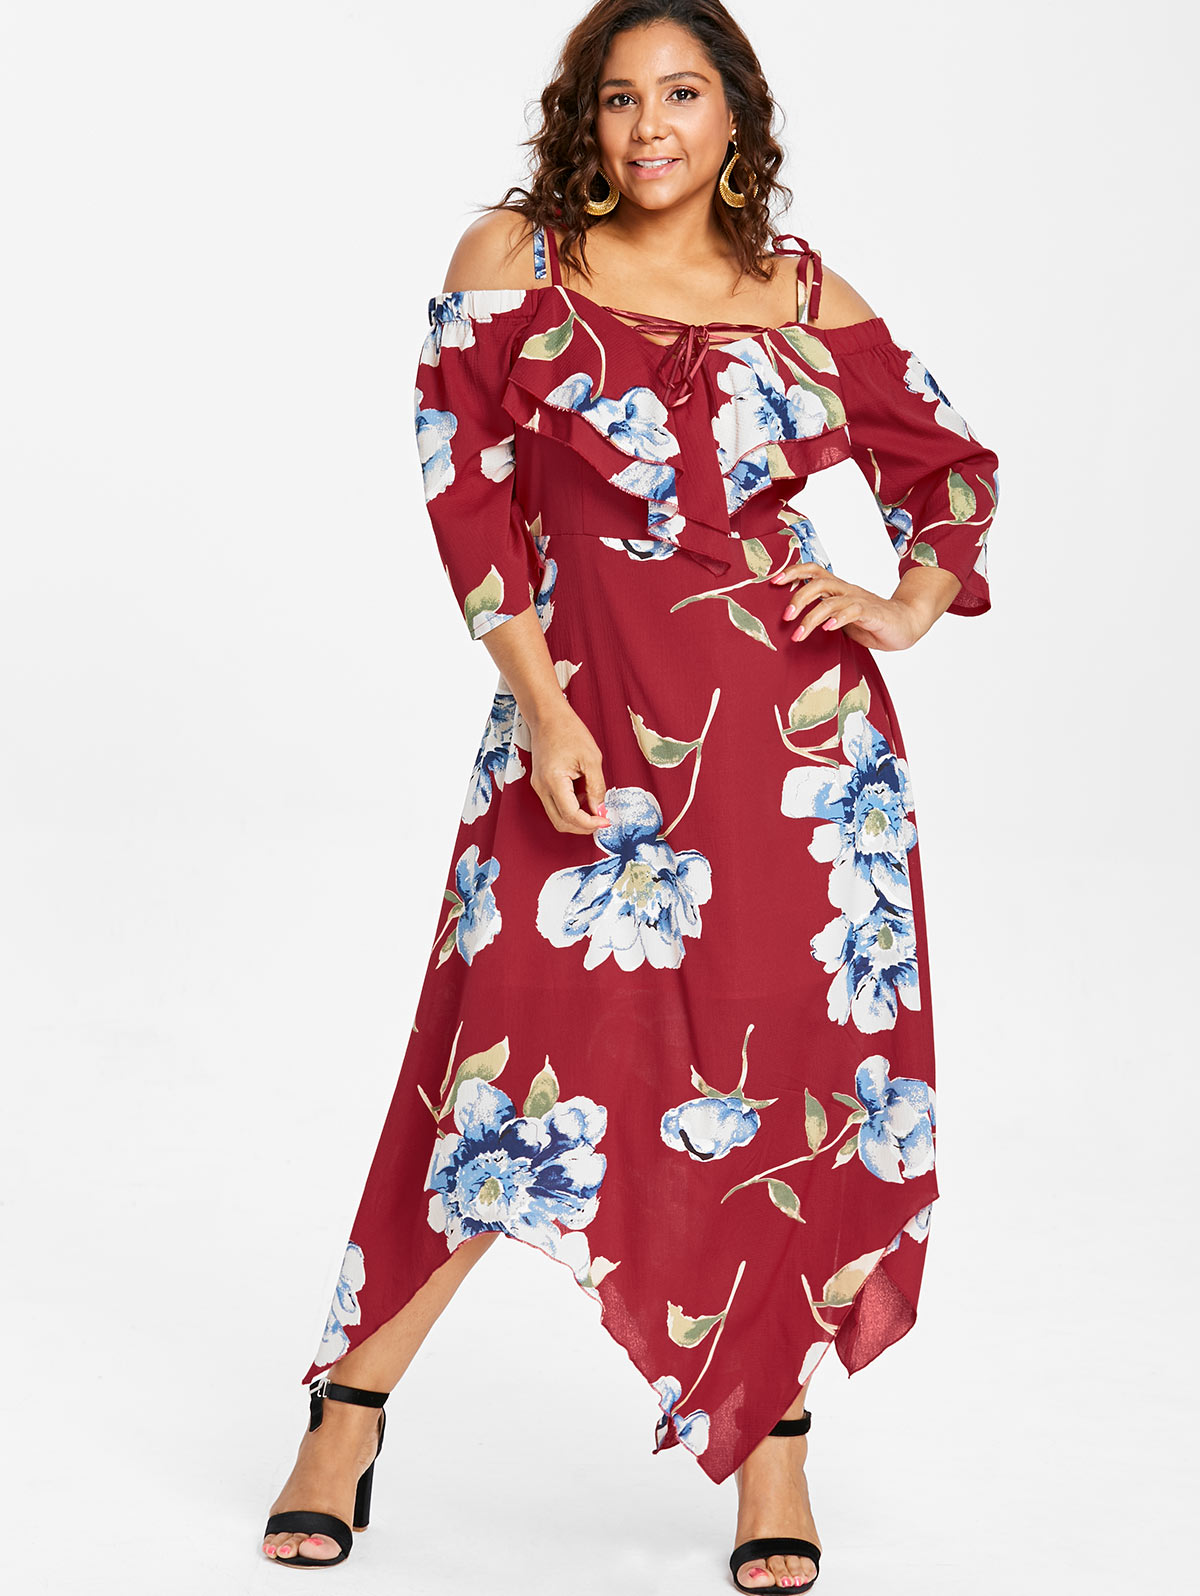 Wipalo Plus Size Cold Shoulder Ruffle Handkerchief Dress ...